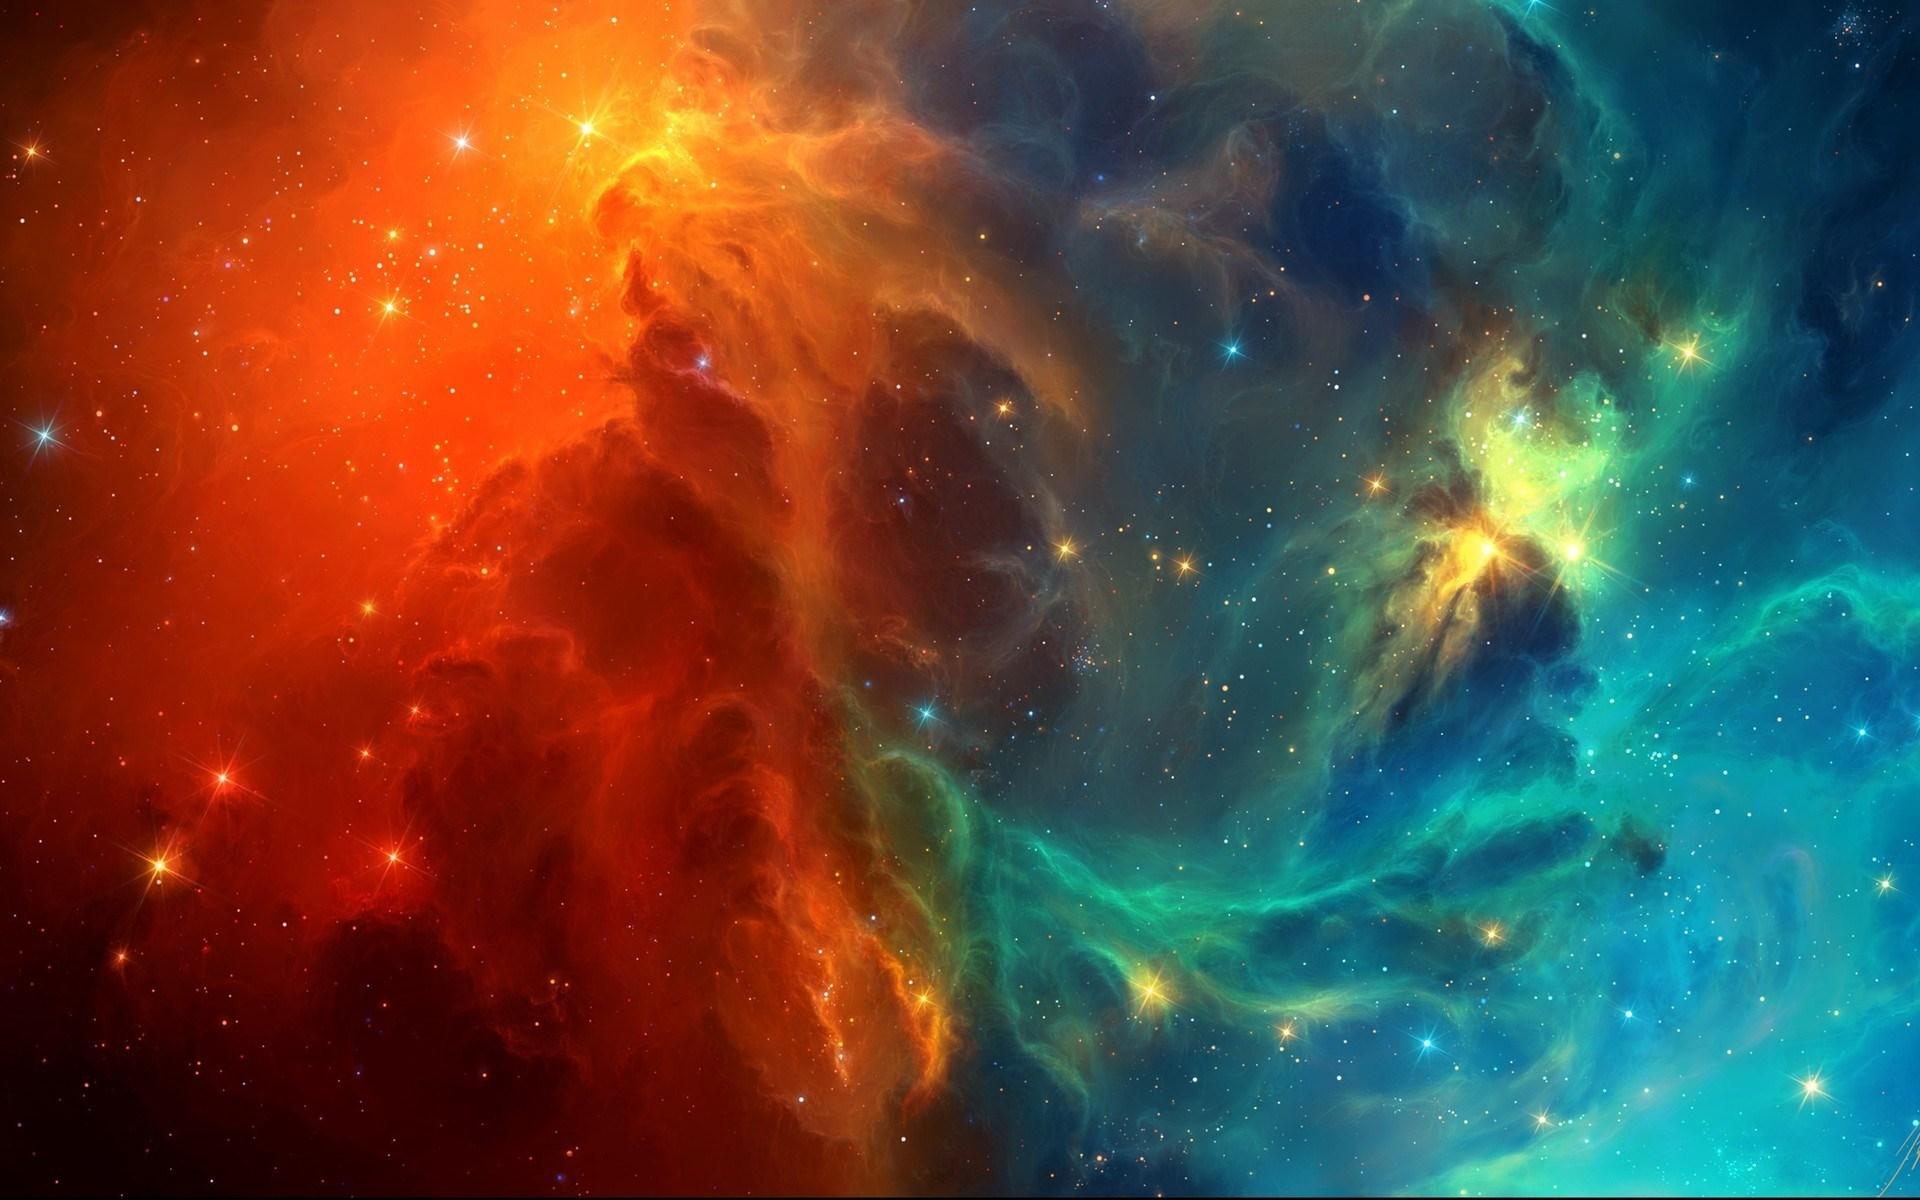 Space Nebula Hd Wallpaper Freehdwalls